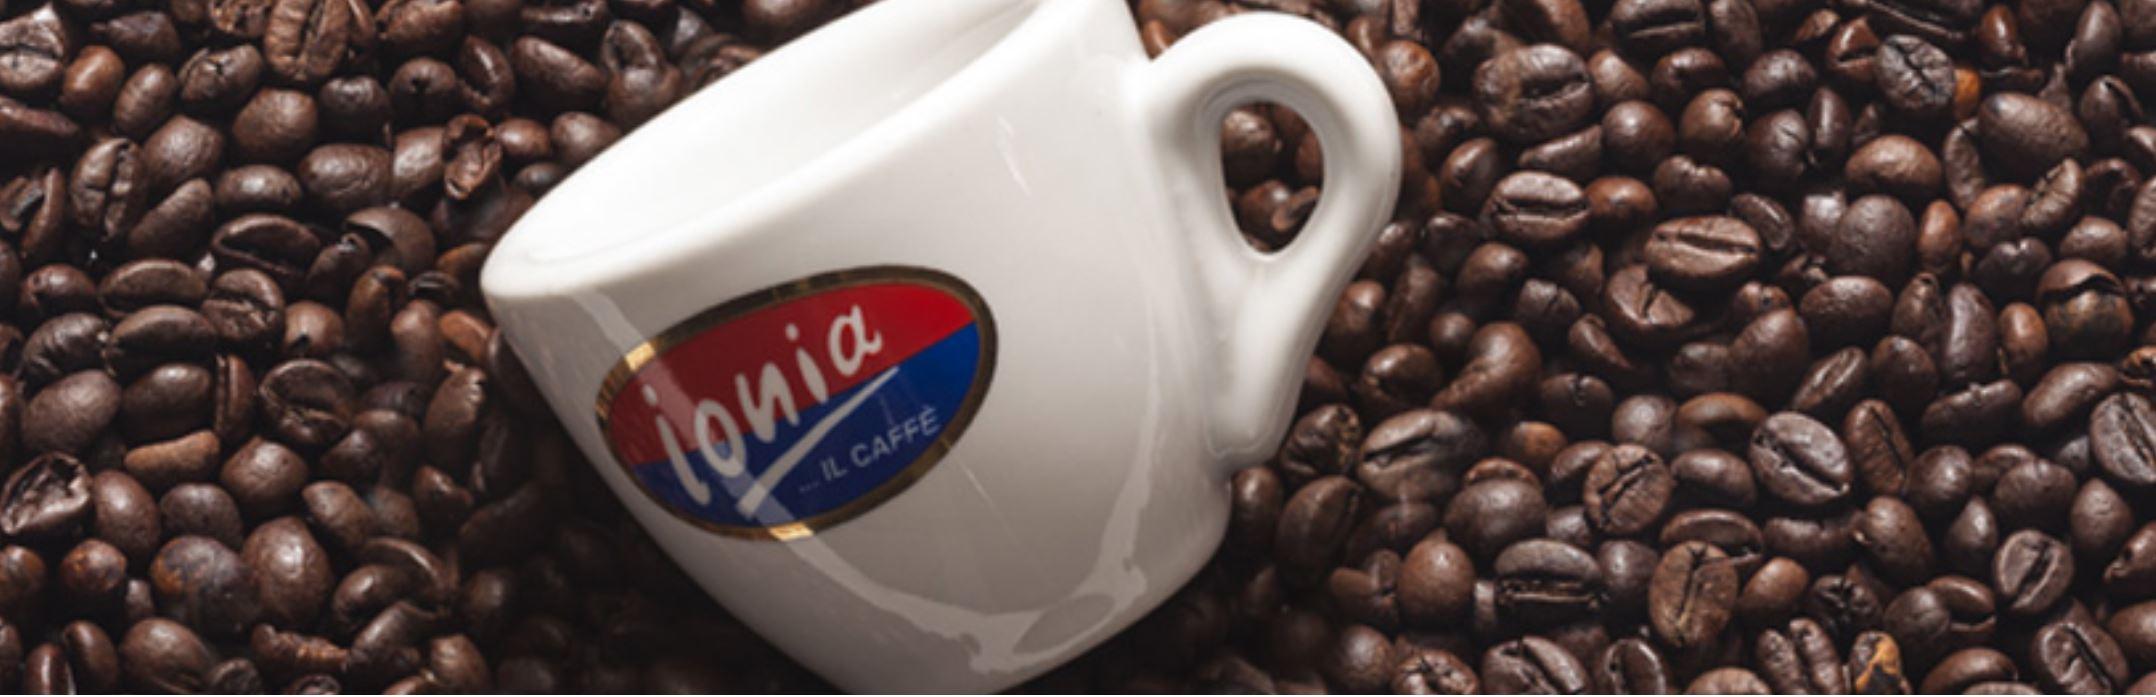 Ionia-Espressotasse-in-KaffeebohnensWWO6GanRl3ce